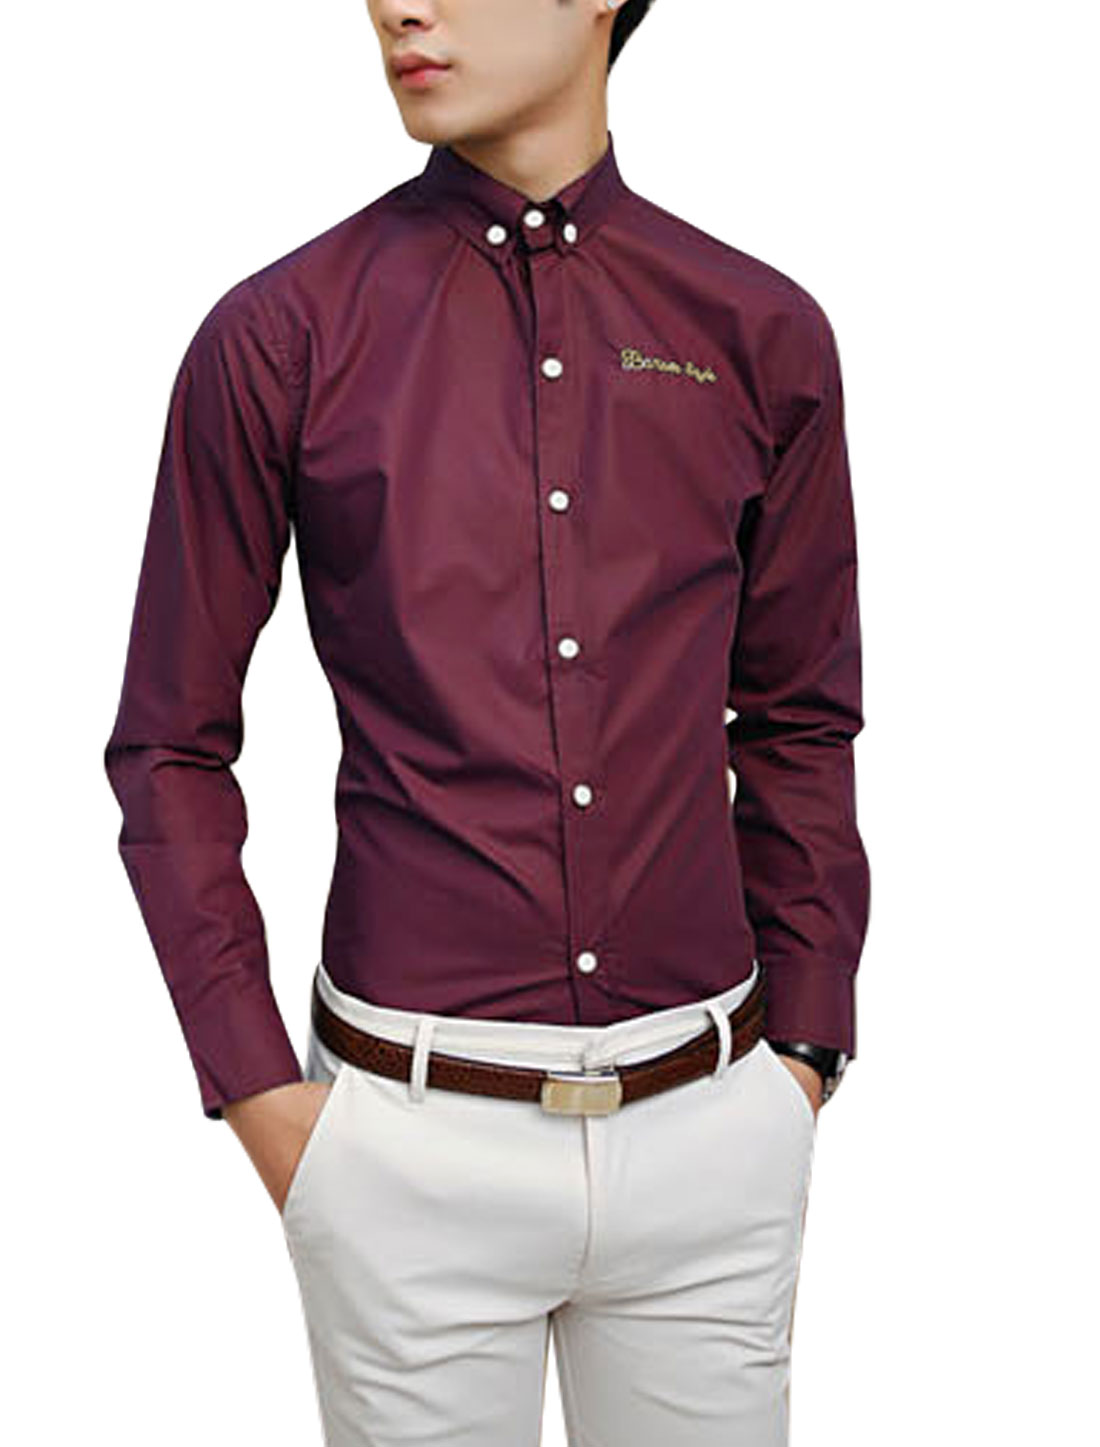 NEW Button Cuffs Point Collar Slim Fit Burgundy Shirt for Man M